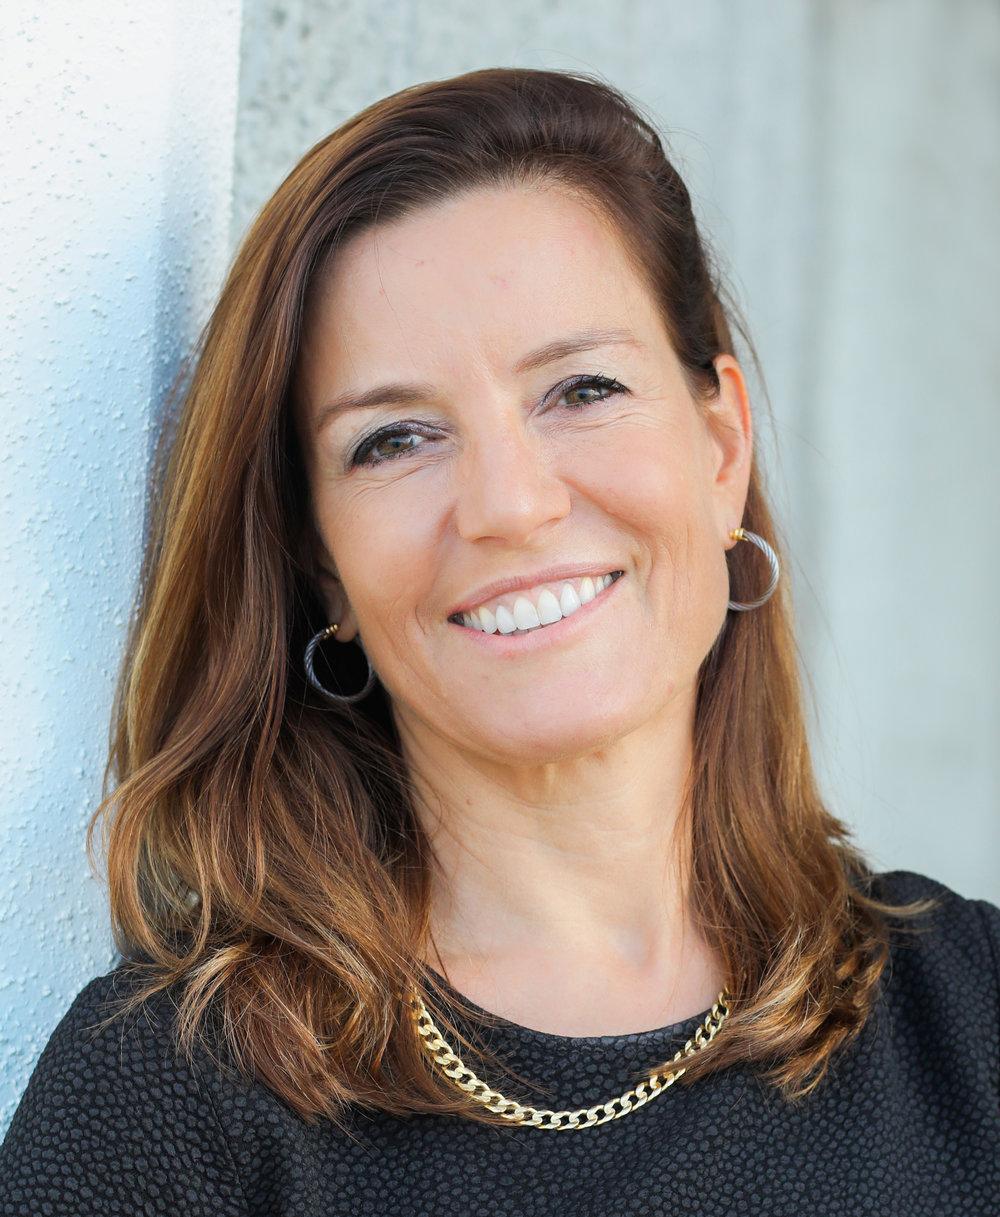 Pamela Tenaerts (Durham, USA)